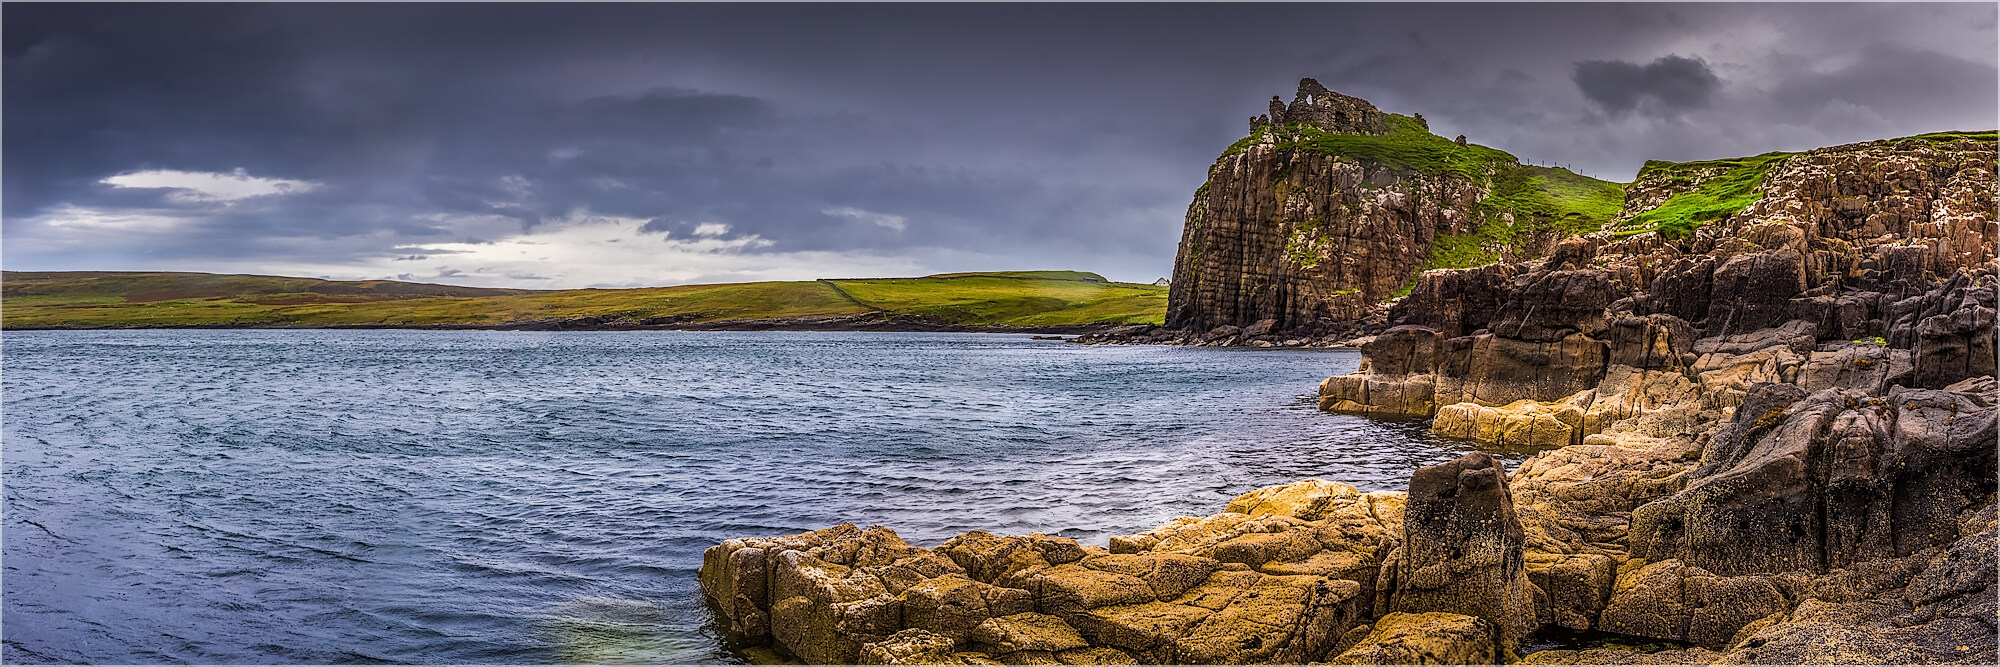 Panoramabild Schottland Duntulm Castle Isle of Skye